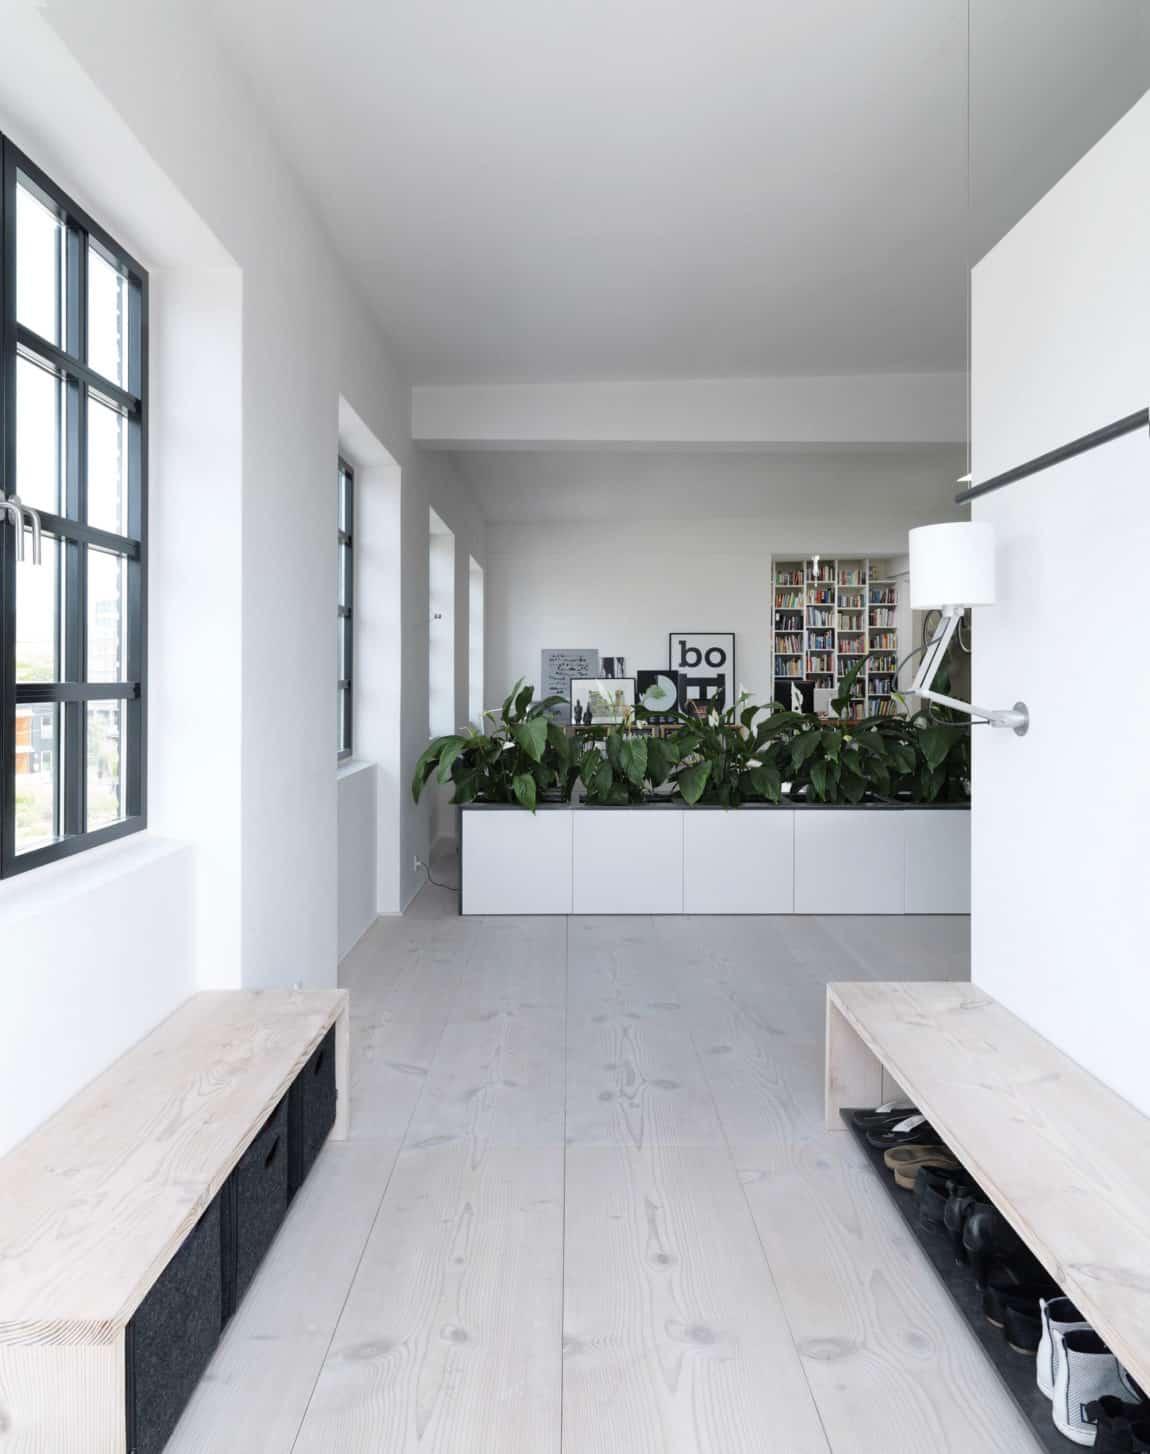 The Home of Morten Bo Jensen by Vipp (2)